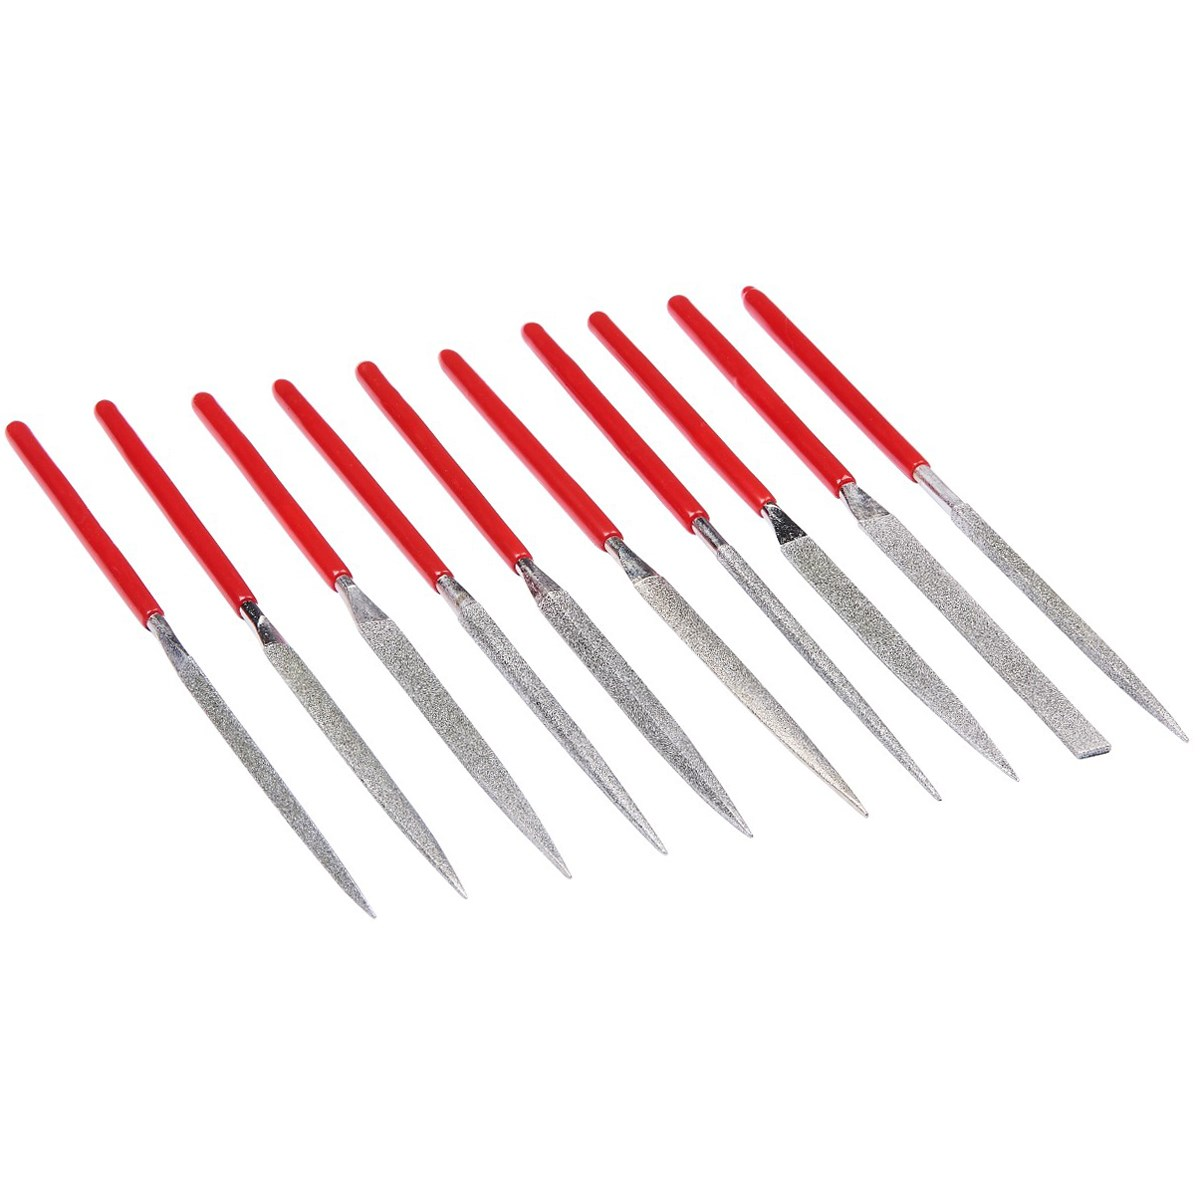 10pc diamond needle file set - Amtech